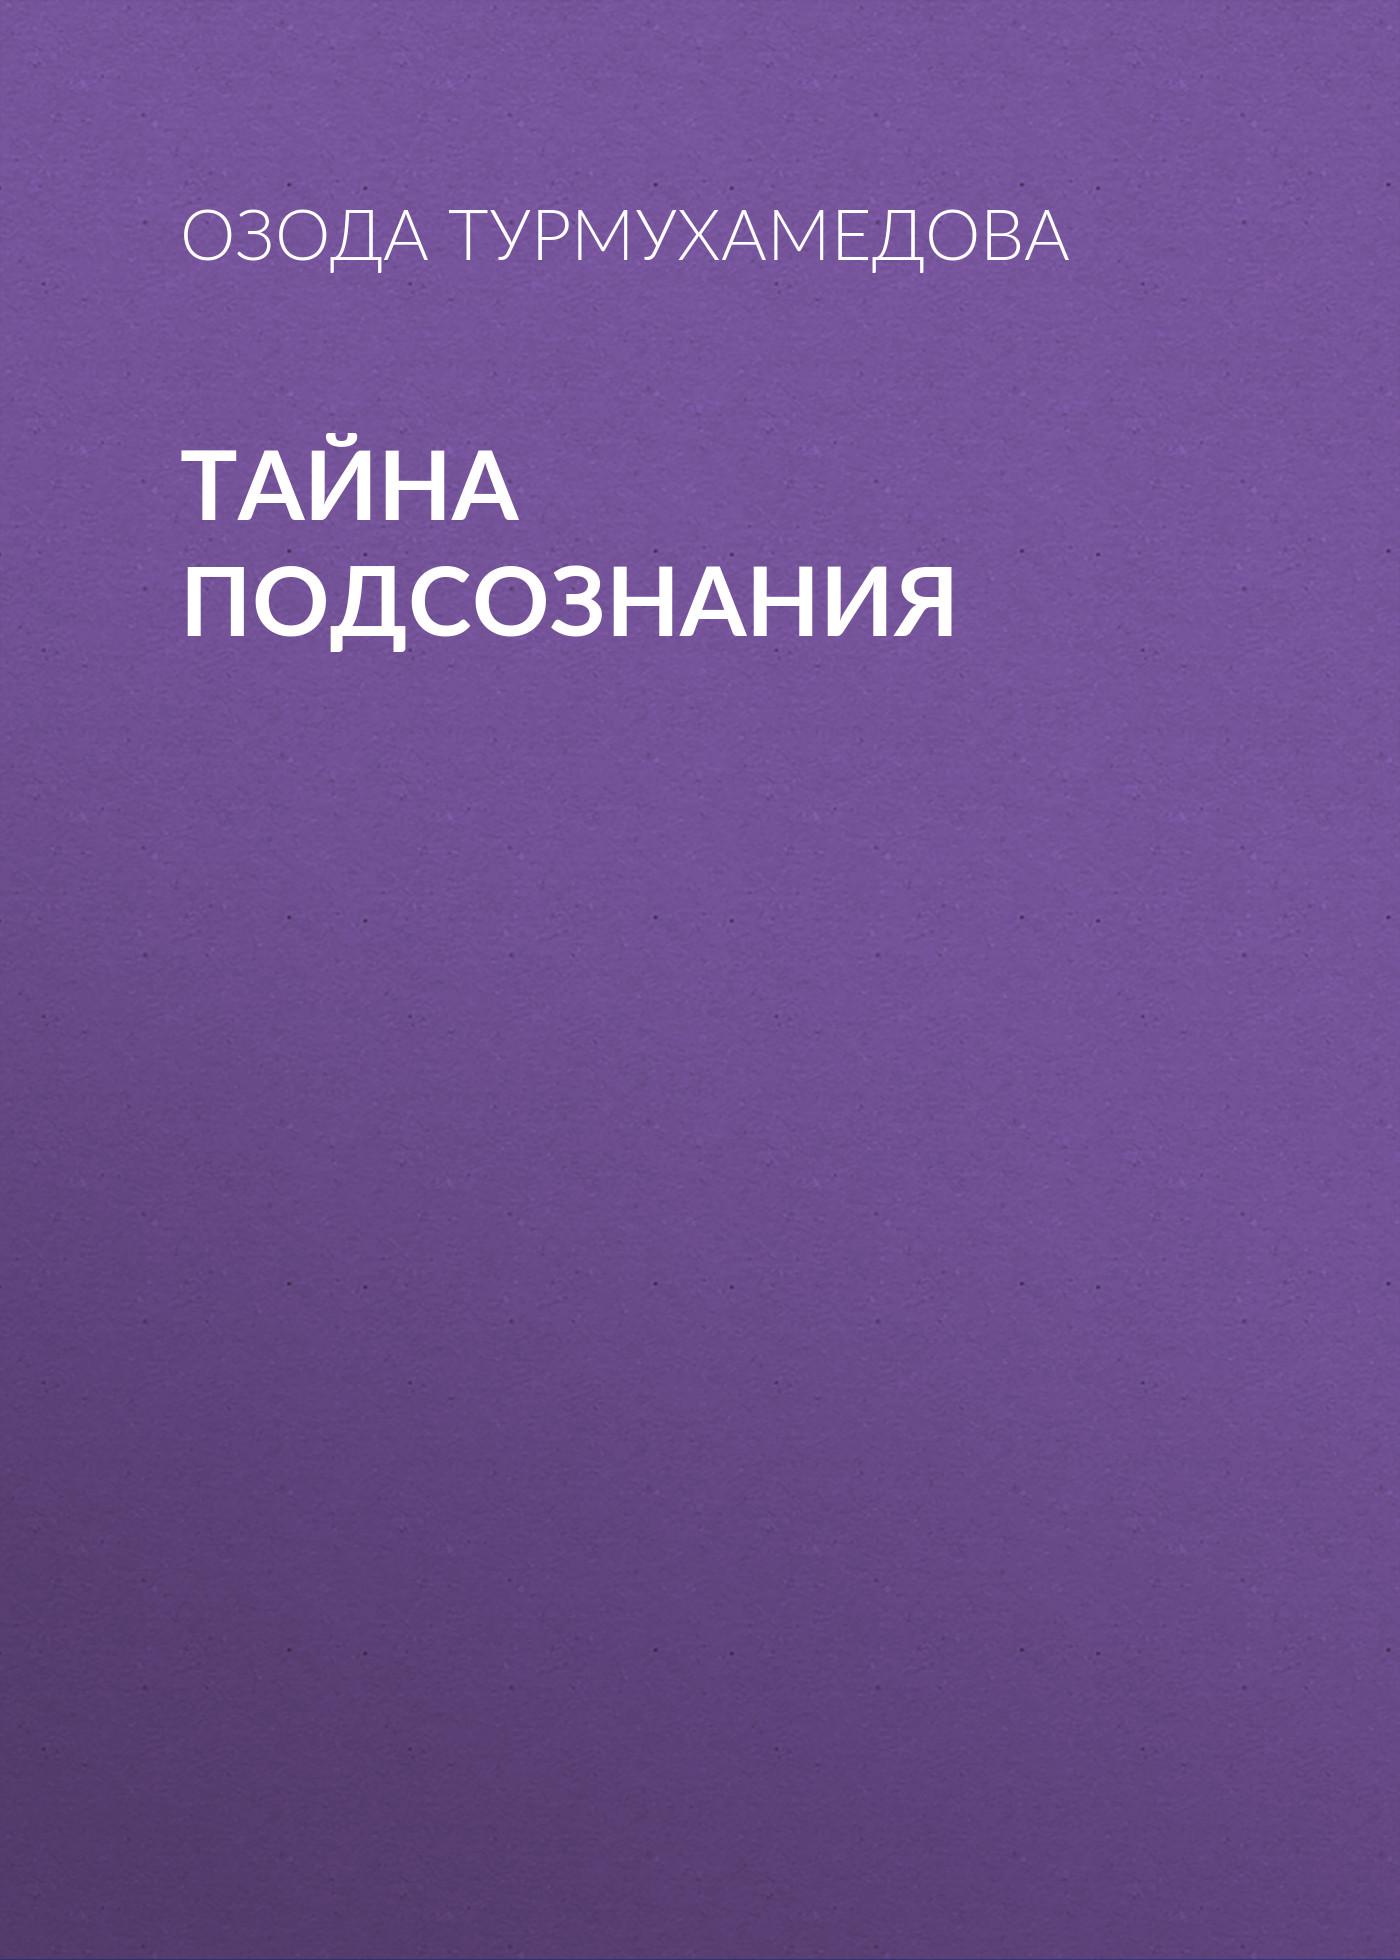 Озода Турмухамедова «Тайна подсознания»